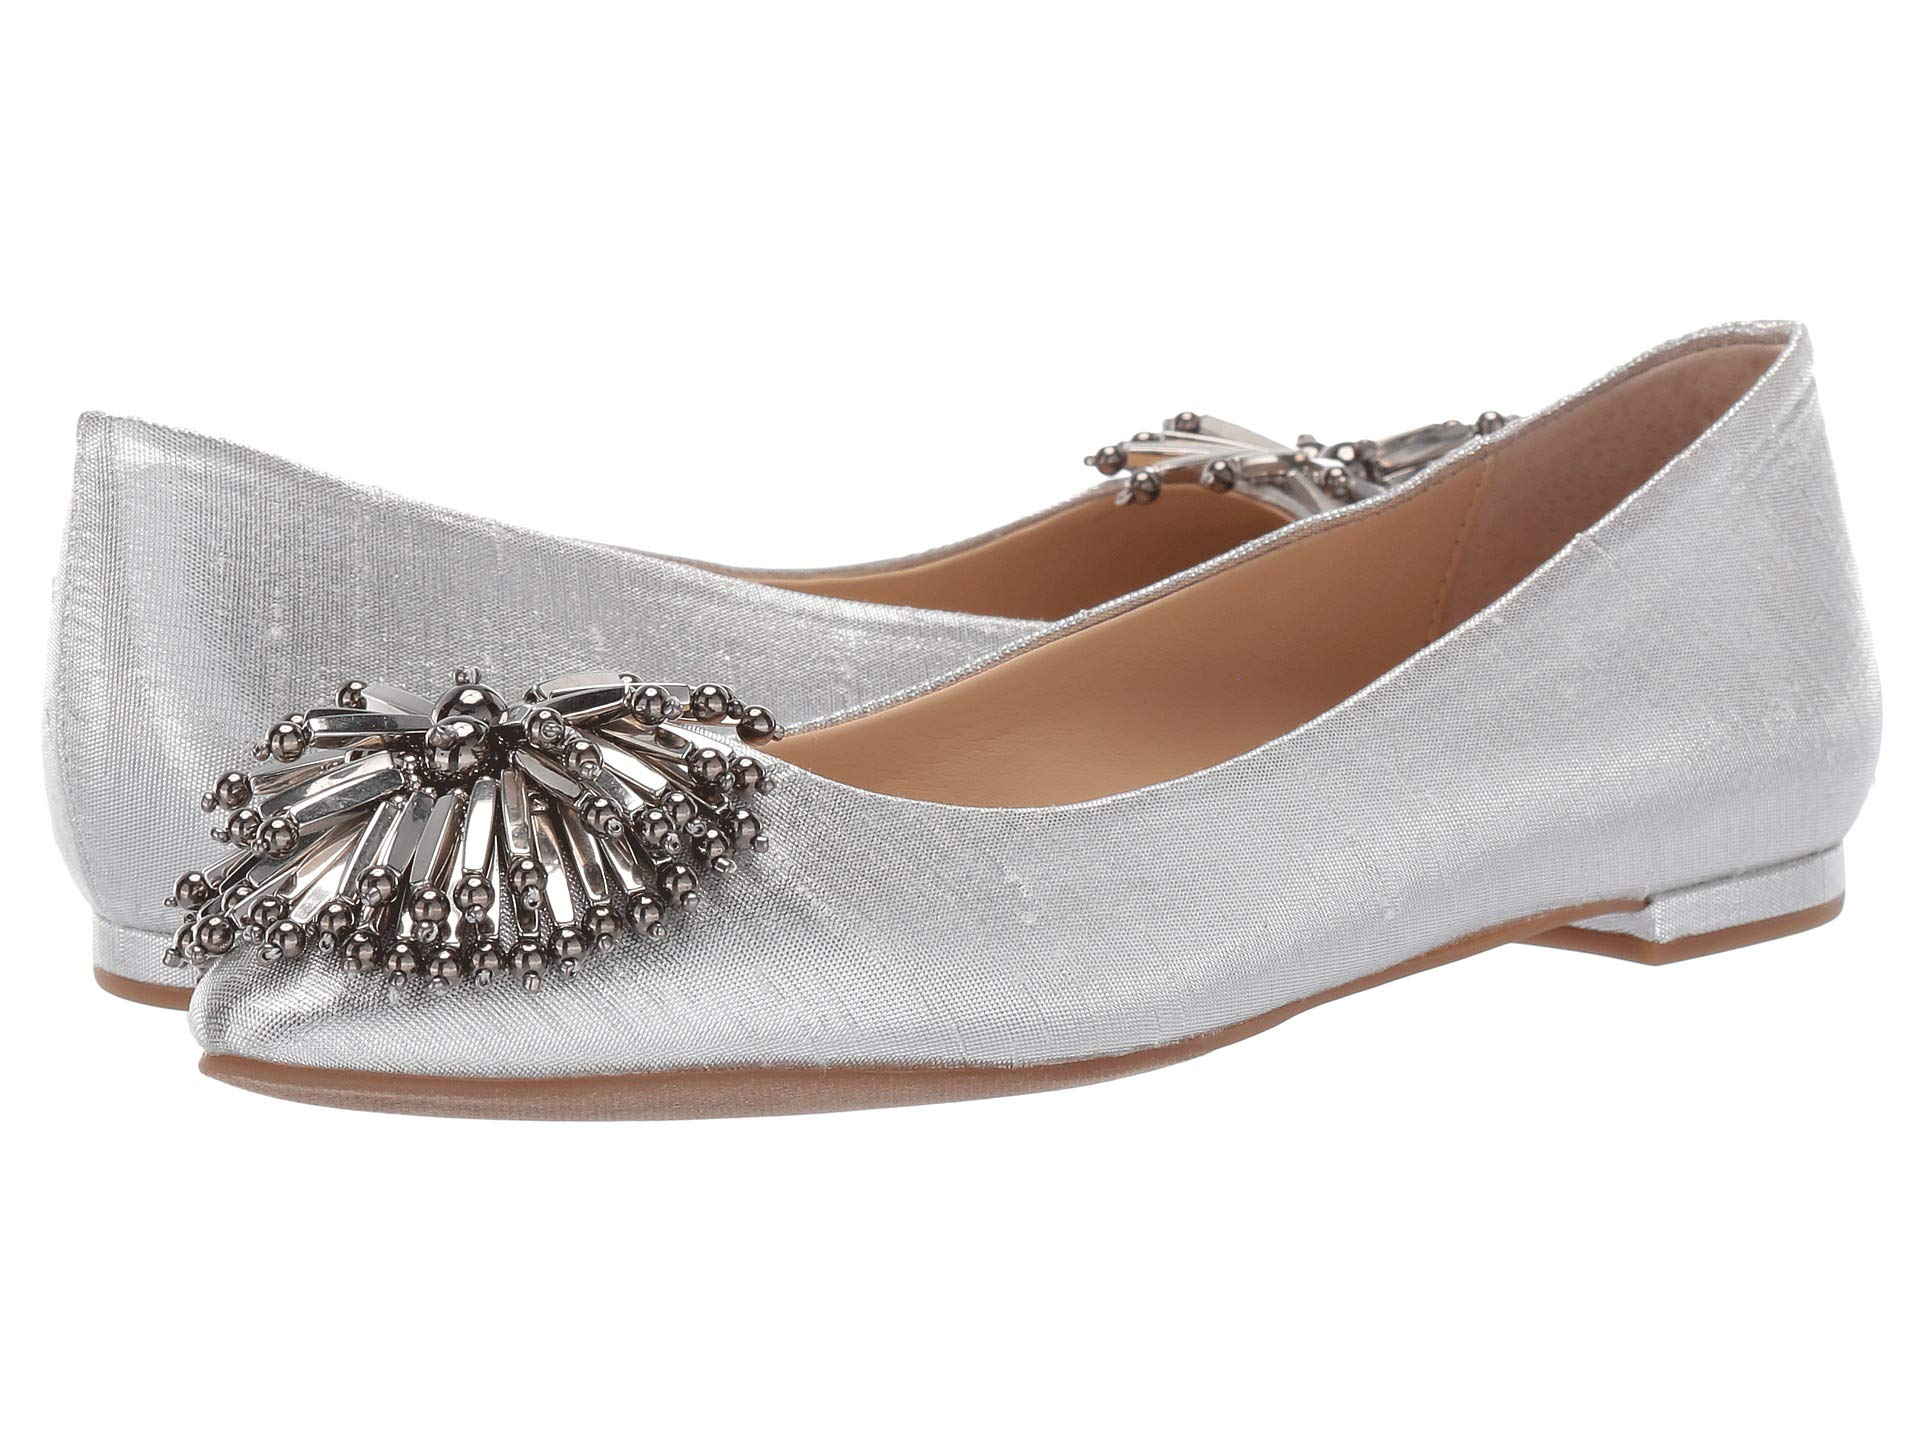 Silver Shiny The Rayann Perry Katy Woven xZ6qCS